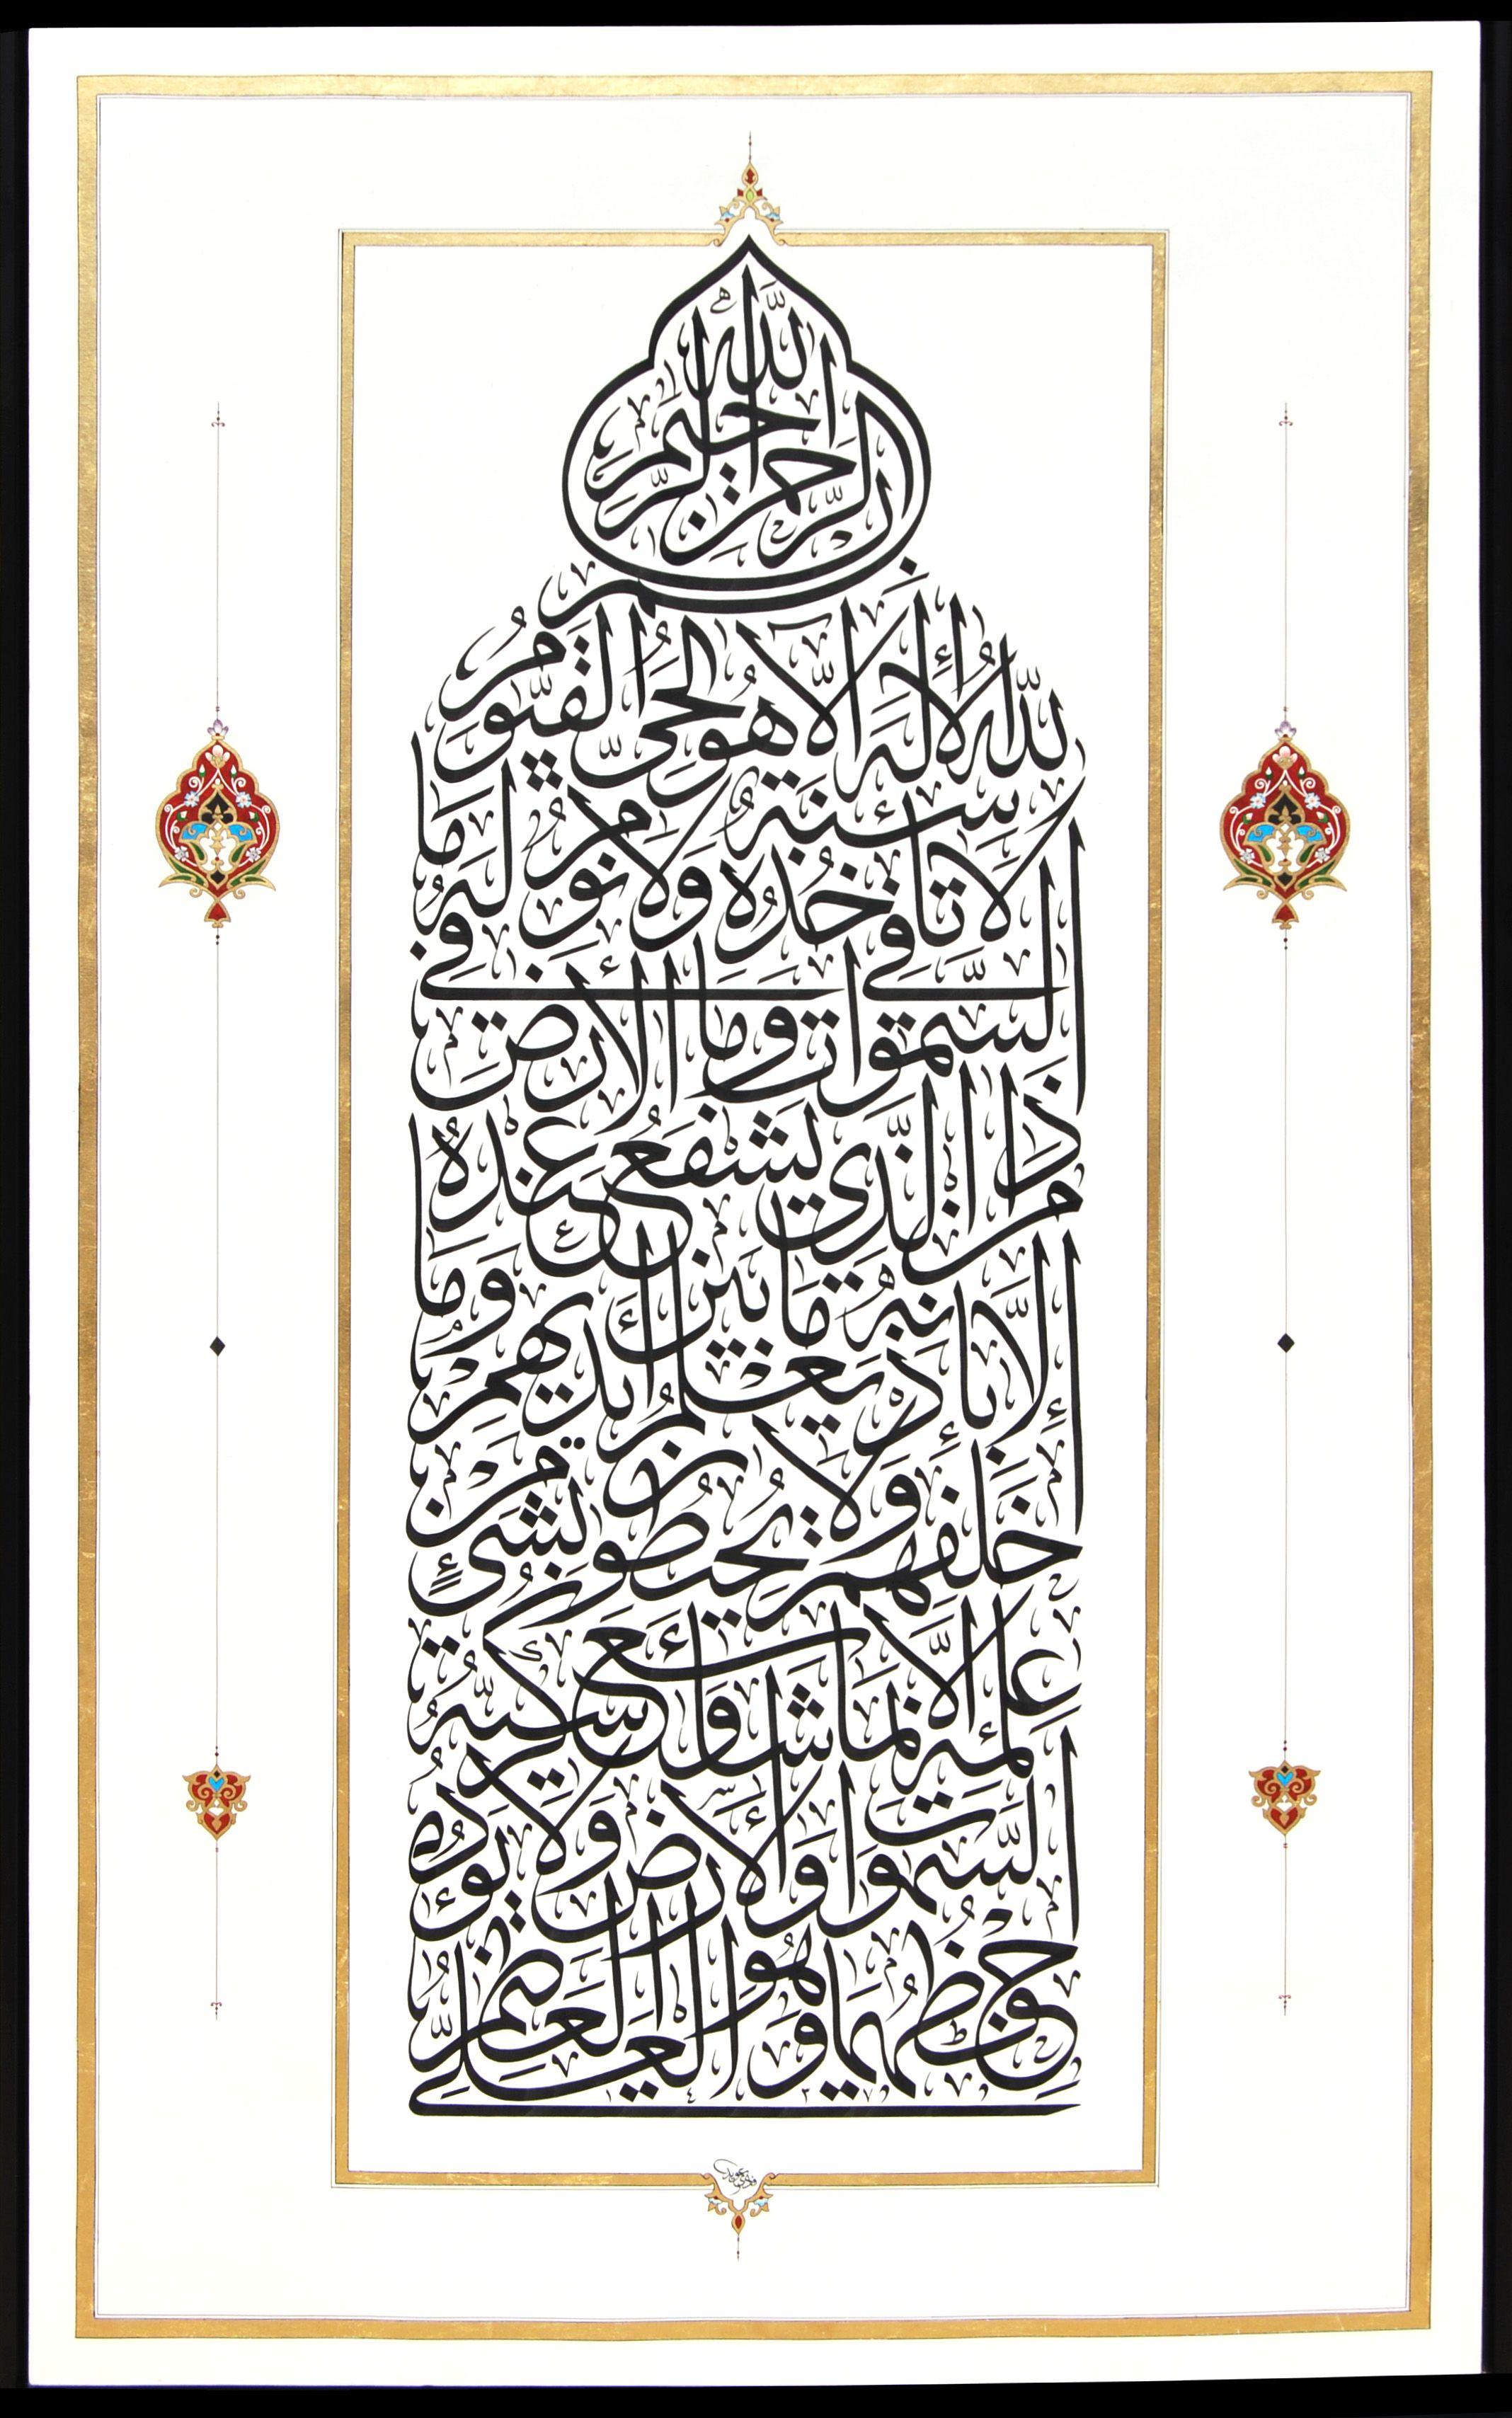 Arabic Calligraphy Art Piece آية الكرسي بسم الله الرحمن الرحيم لالل ه لا إ ل ه إ لا Islamic Art Calligraphy Islamic Calligraphy Islamic Caligraphy Art